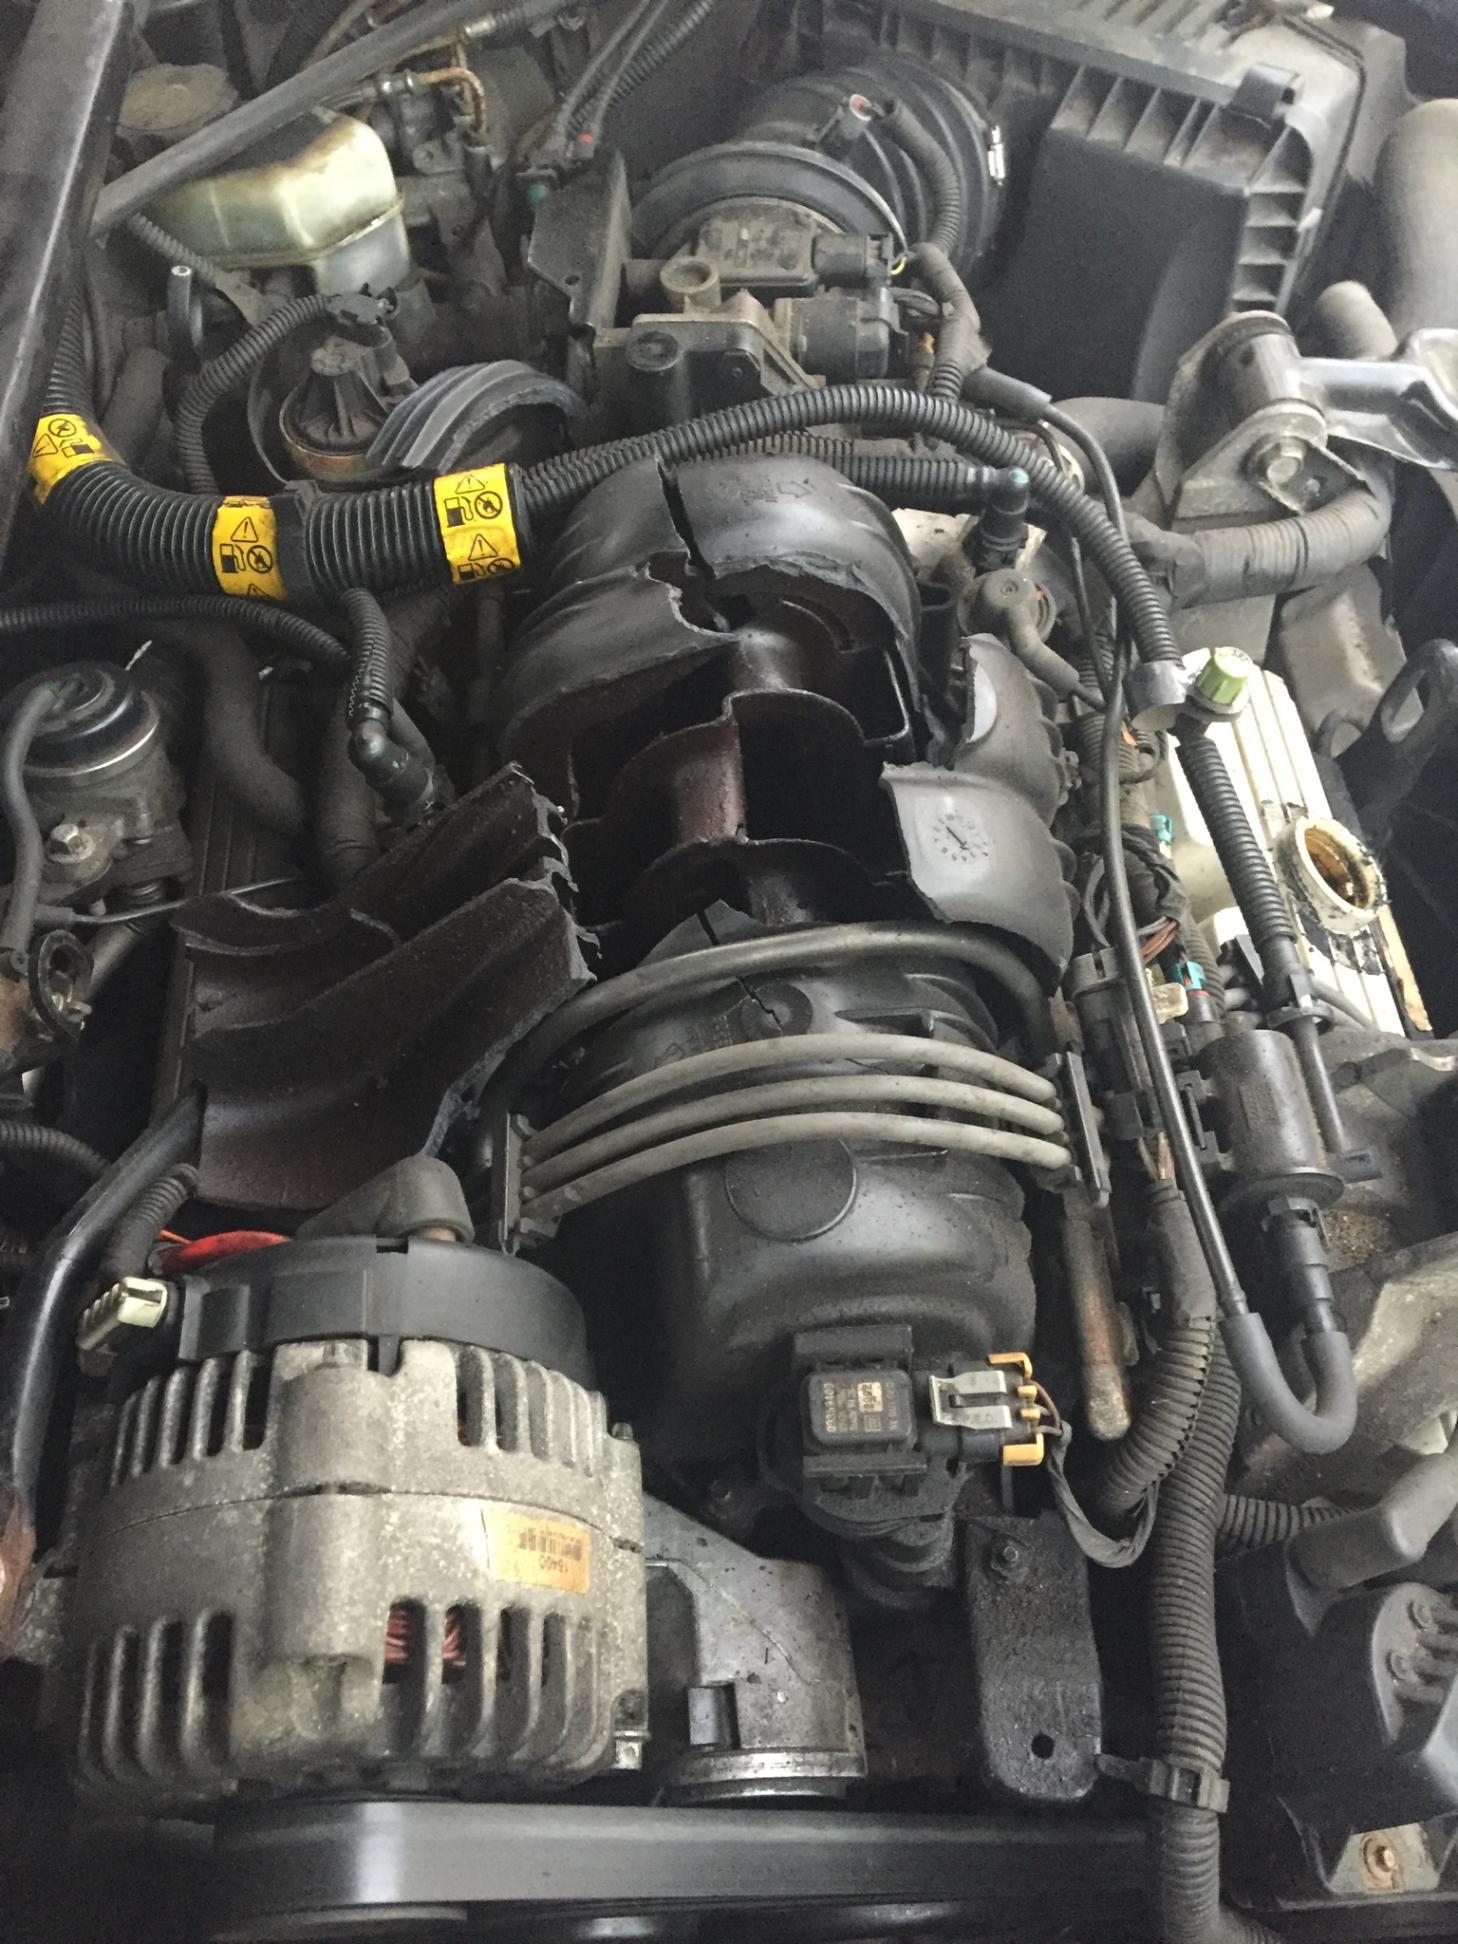 Chevy 2003 Chevrolet Impala Diagram Intake Manifold Exploded Gm Forum Buick Cadillac